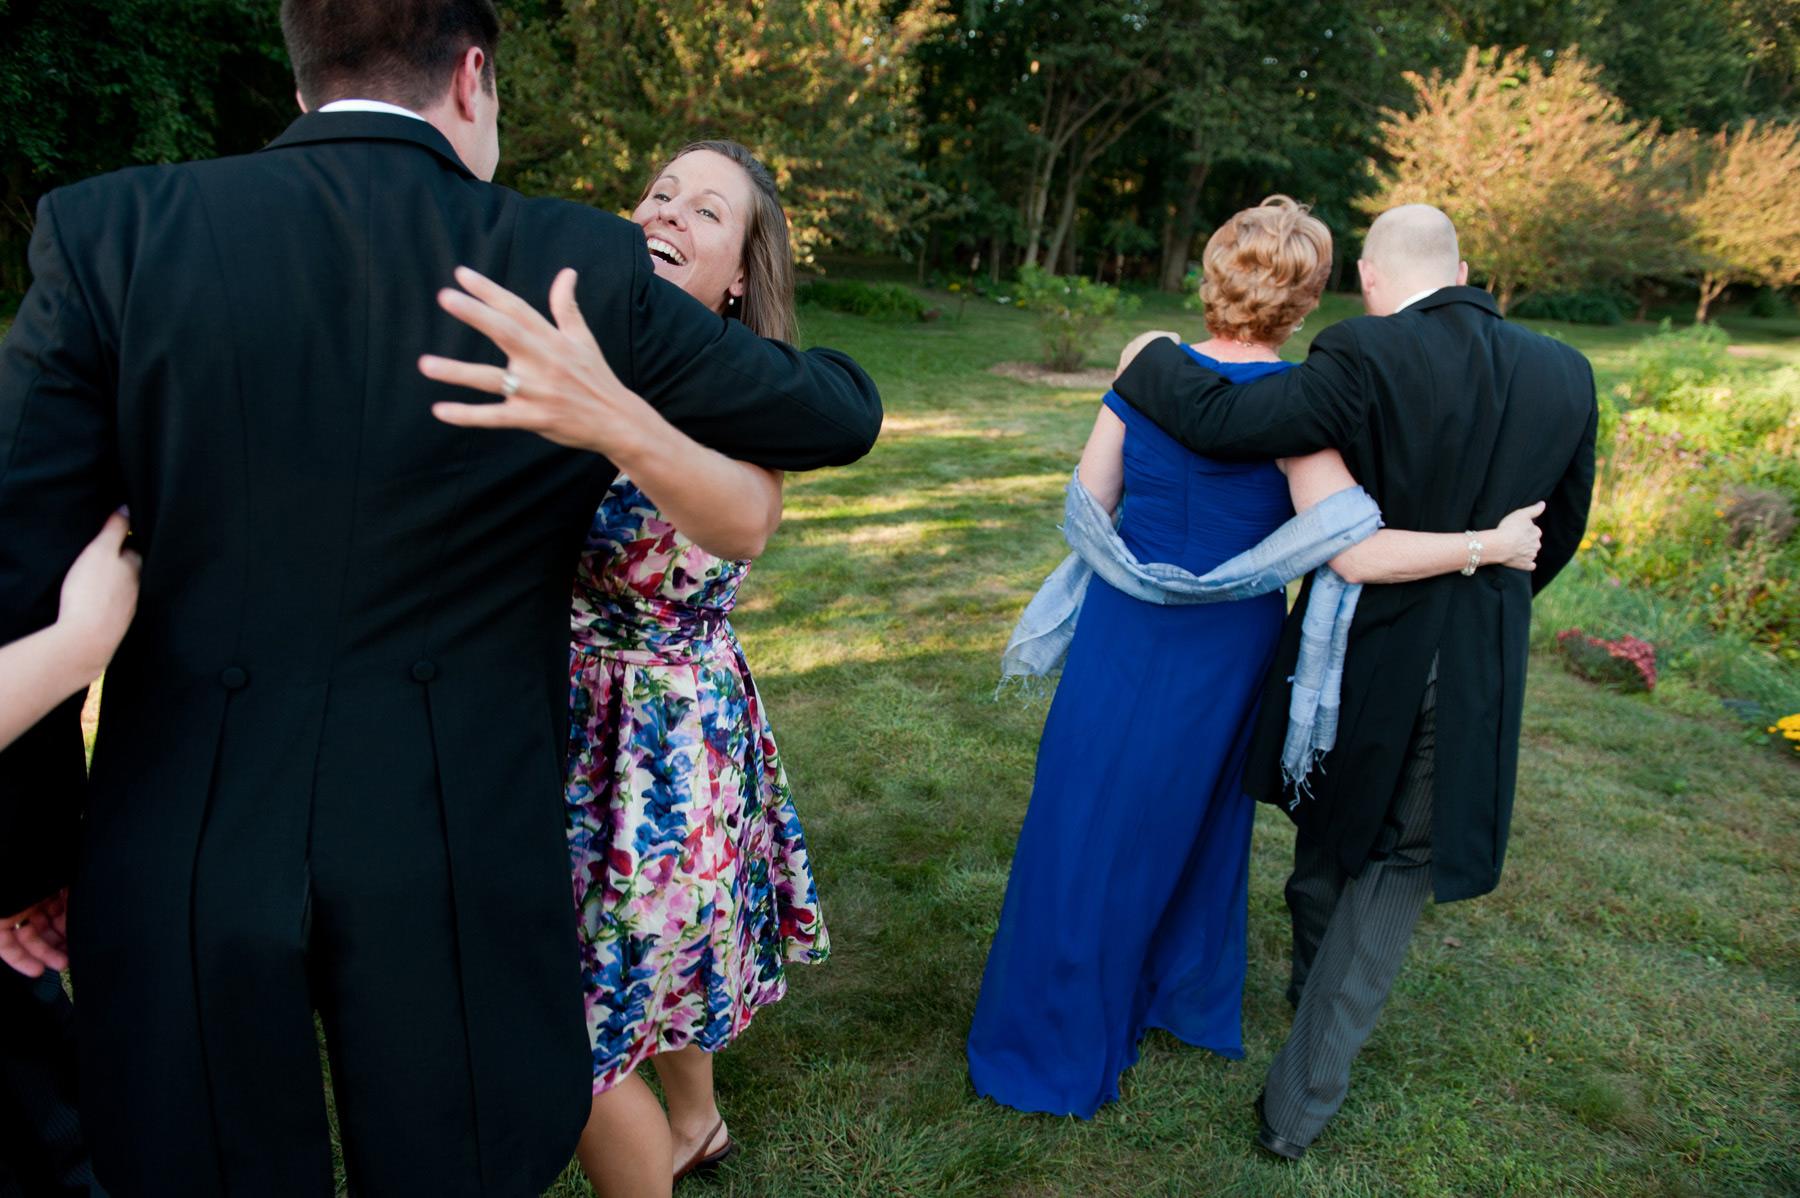 wedding-photography-saint-paul-mark-kegans-668.jpg